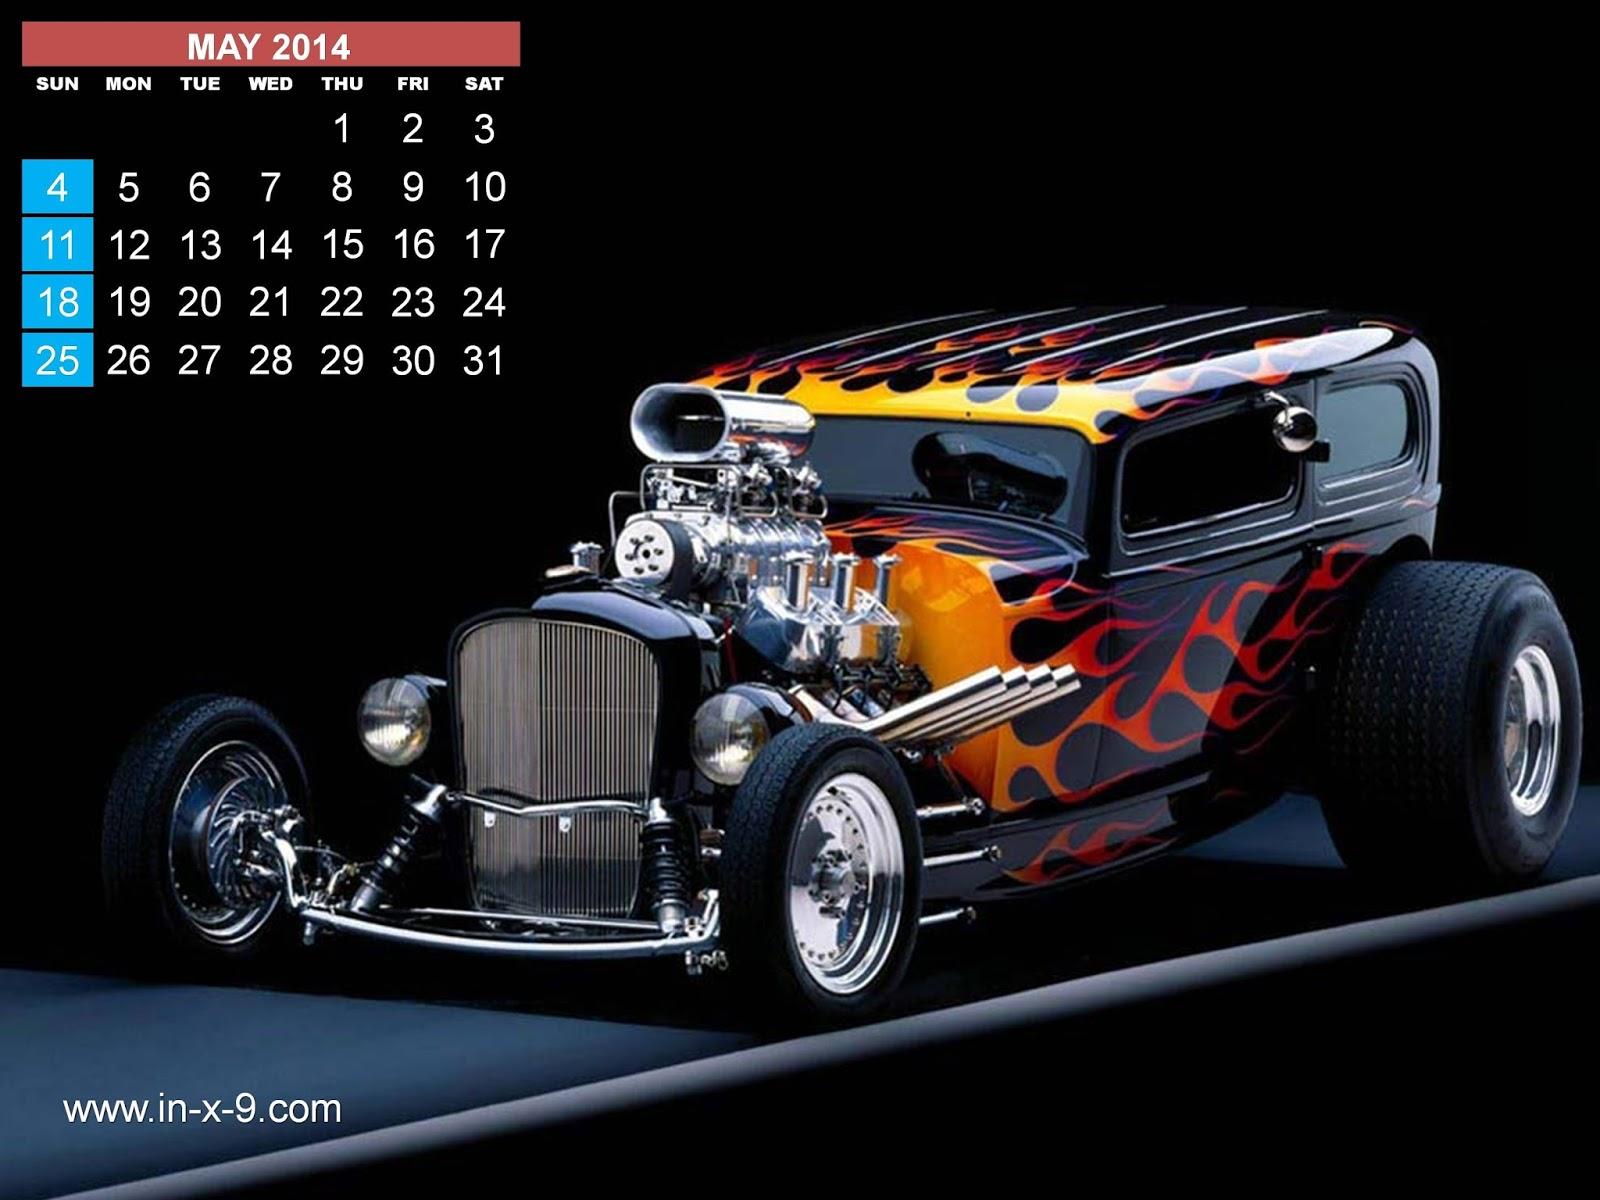 2014 Hot Rods Calendar - Design 1 - free 2014 calendar - 2014 calendar